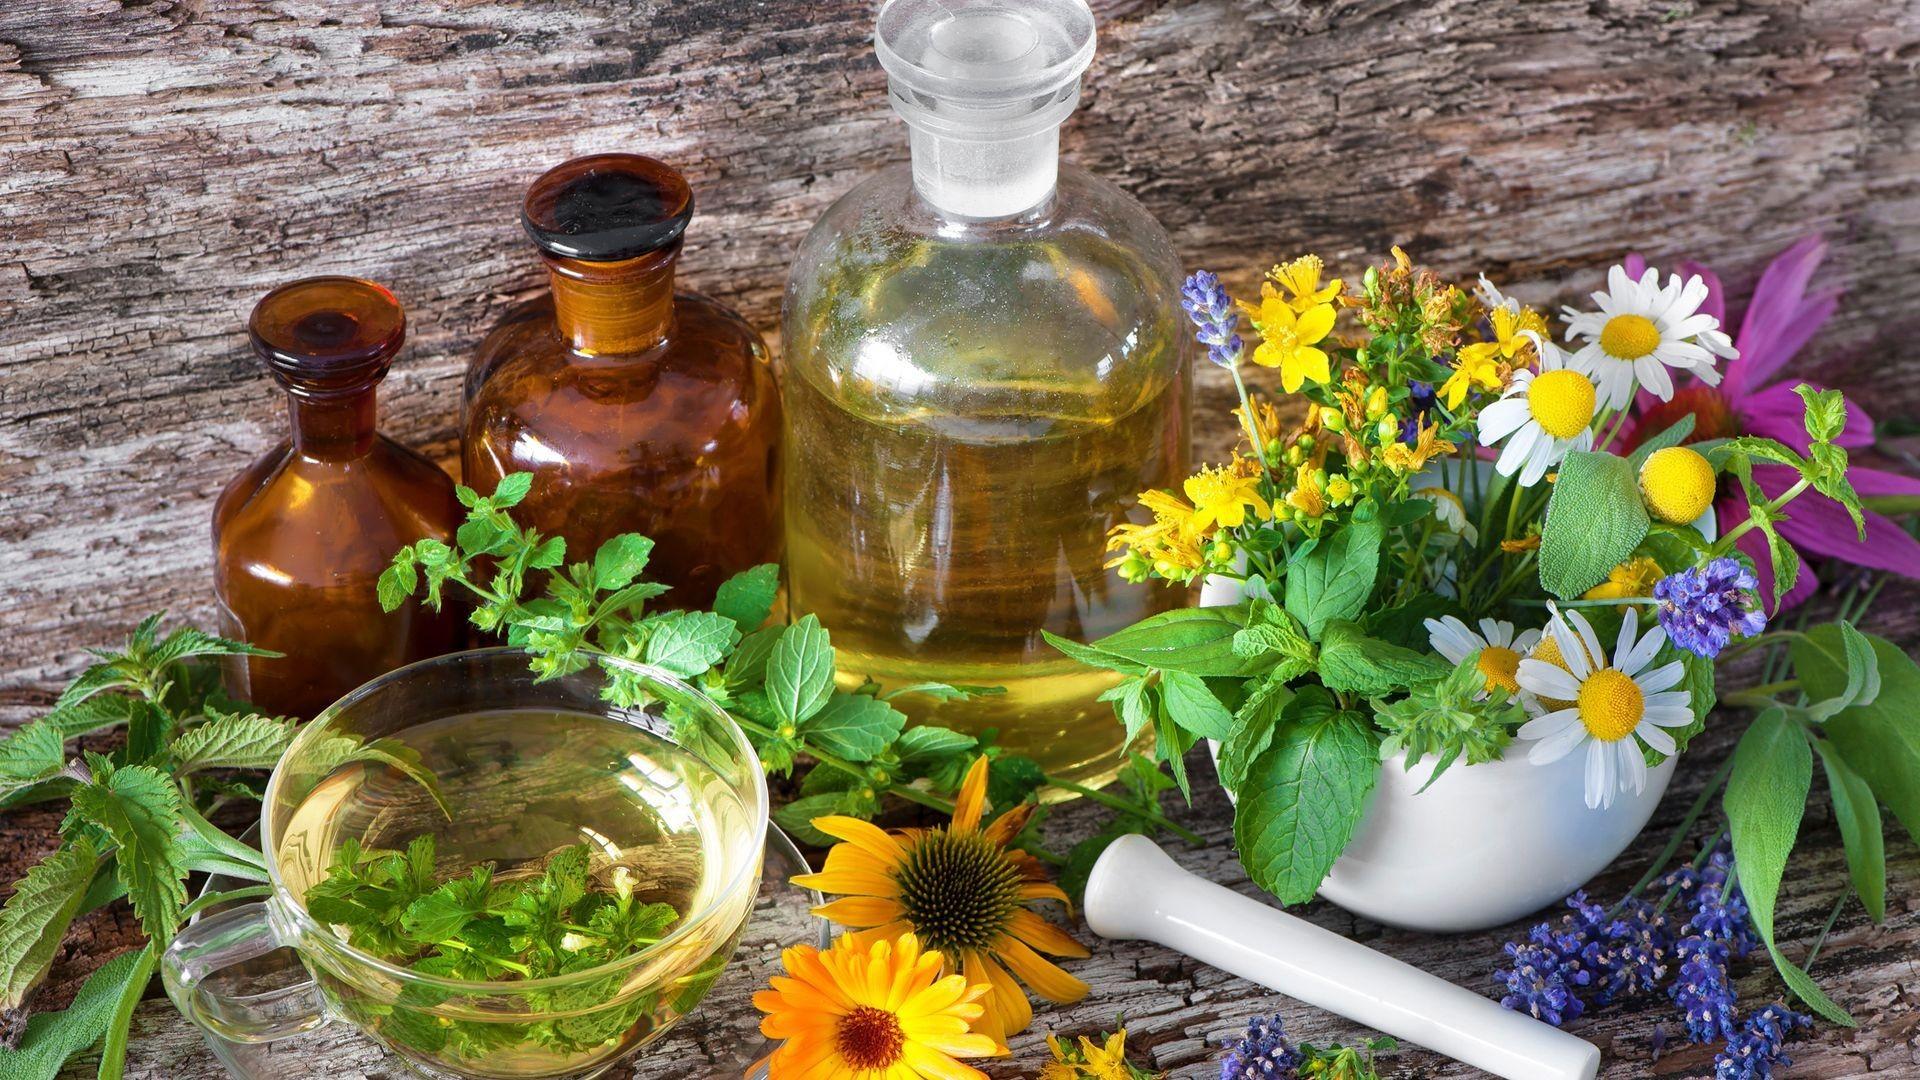 Productos naturales y dietética en Terrassa